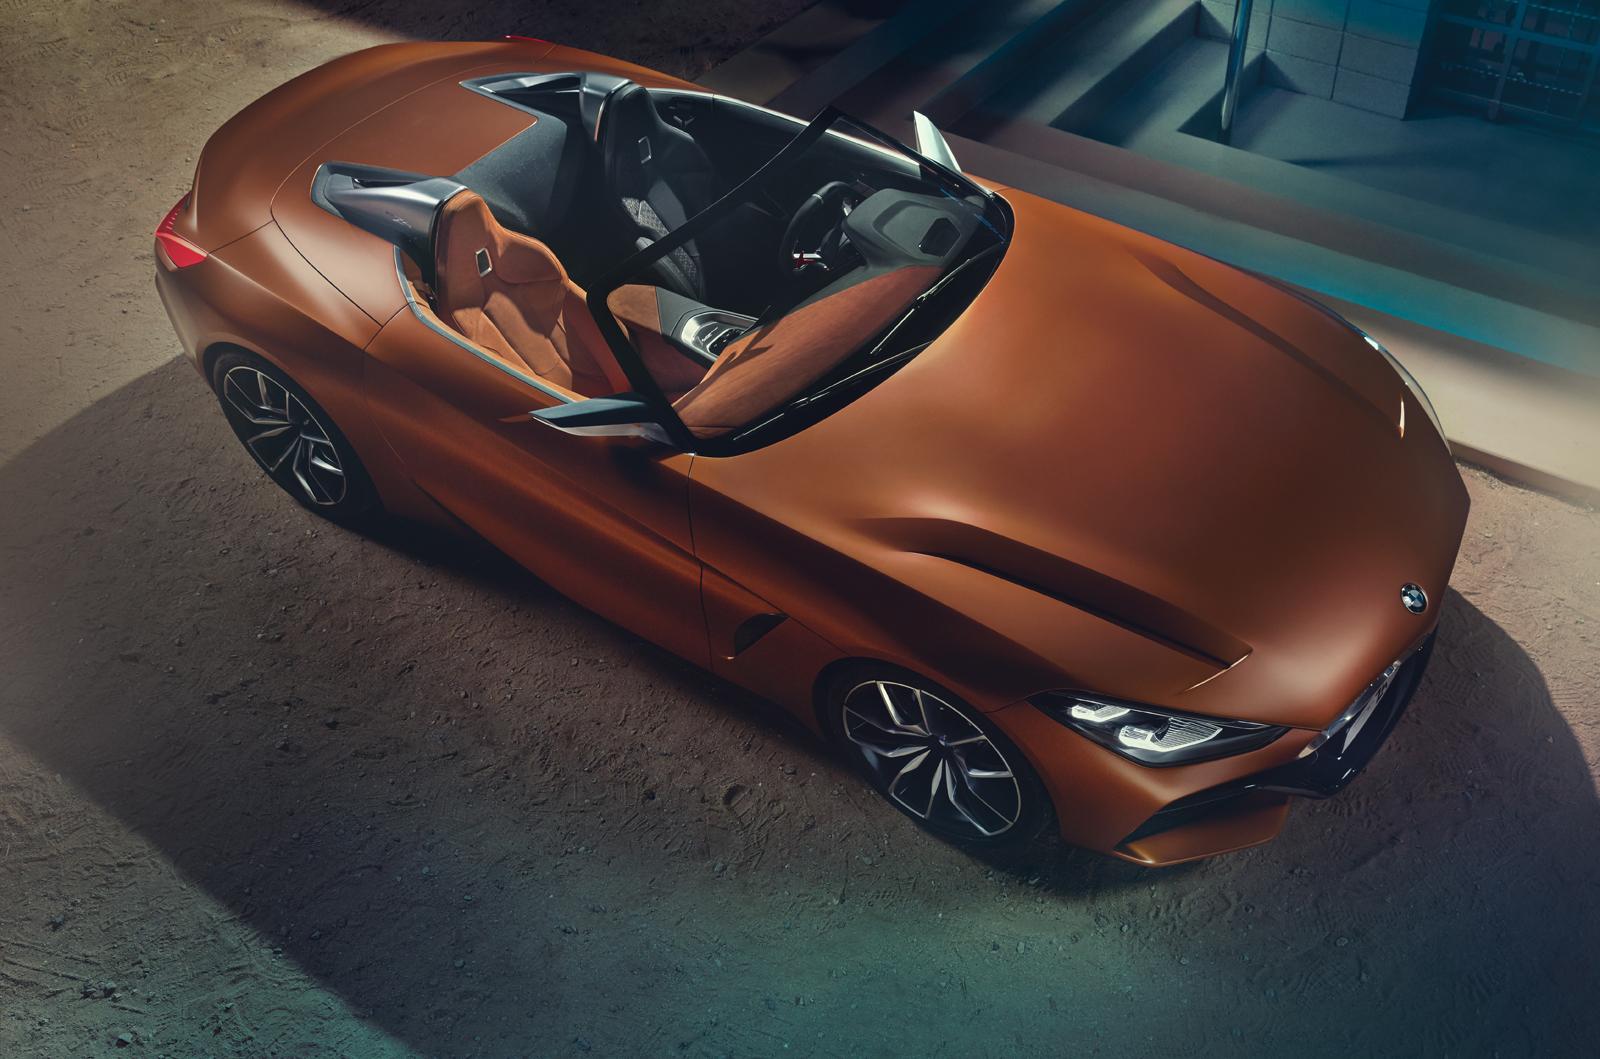 BMW_DCC070_03.jpg